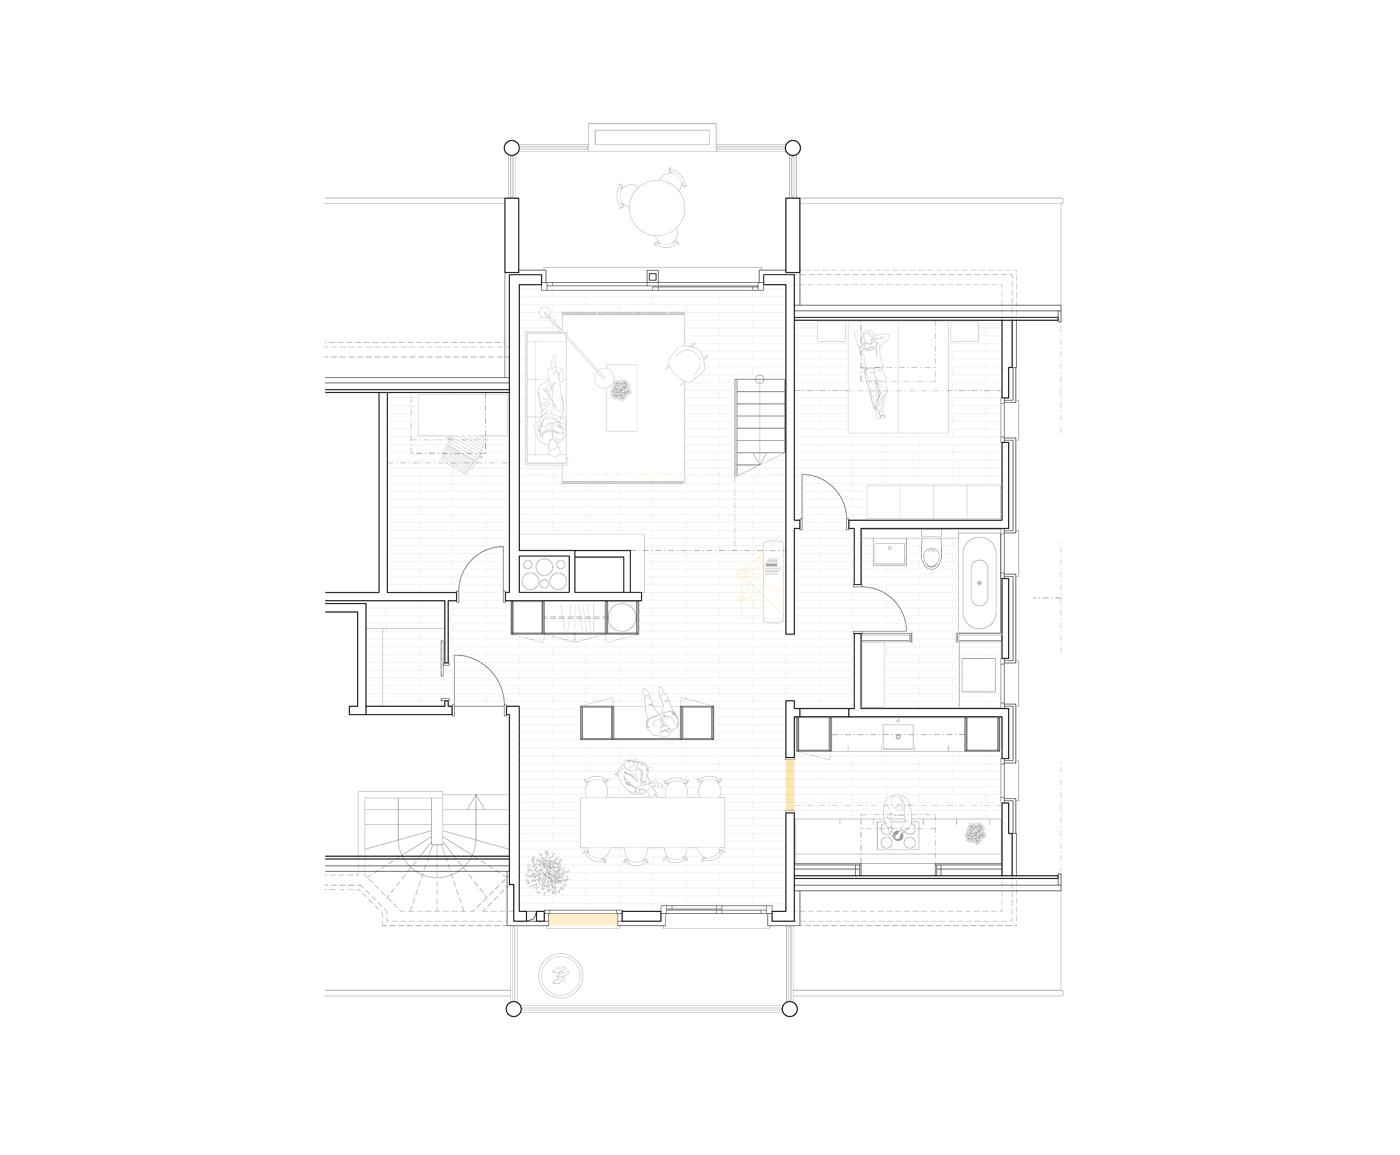 buan architekten – Umbau Attikawohnung Willisau – Grundriss Dachgeschoss